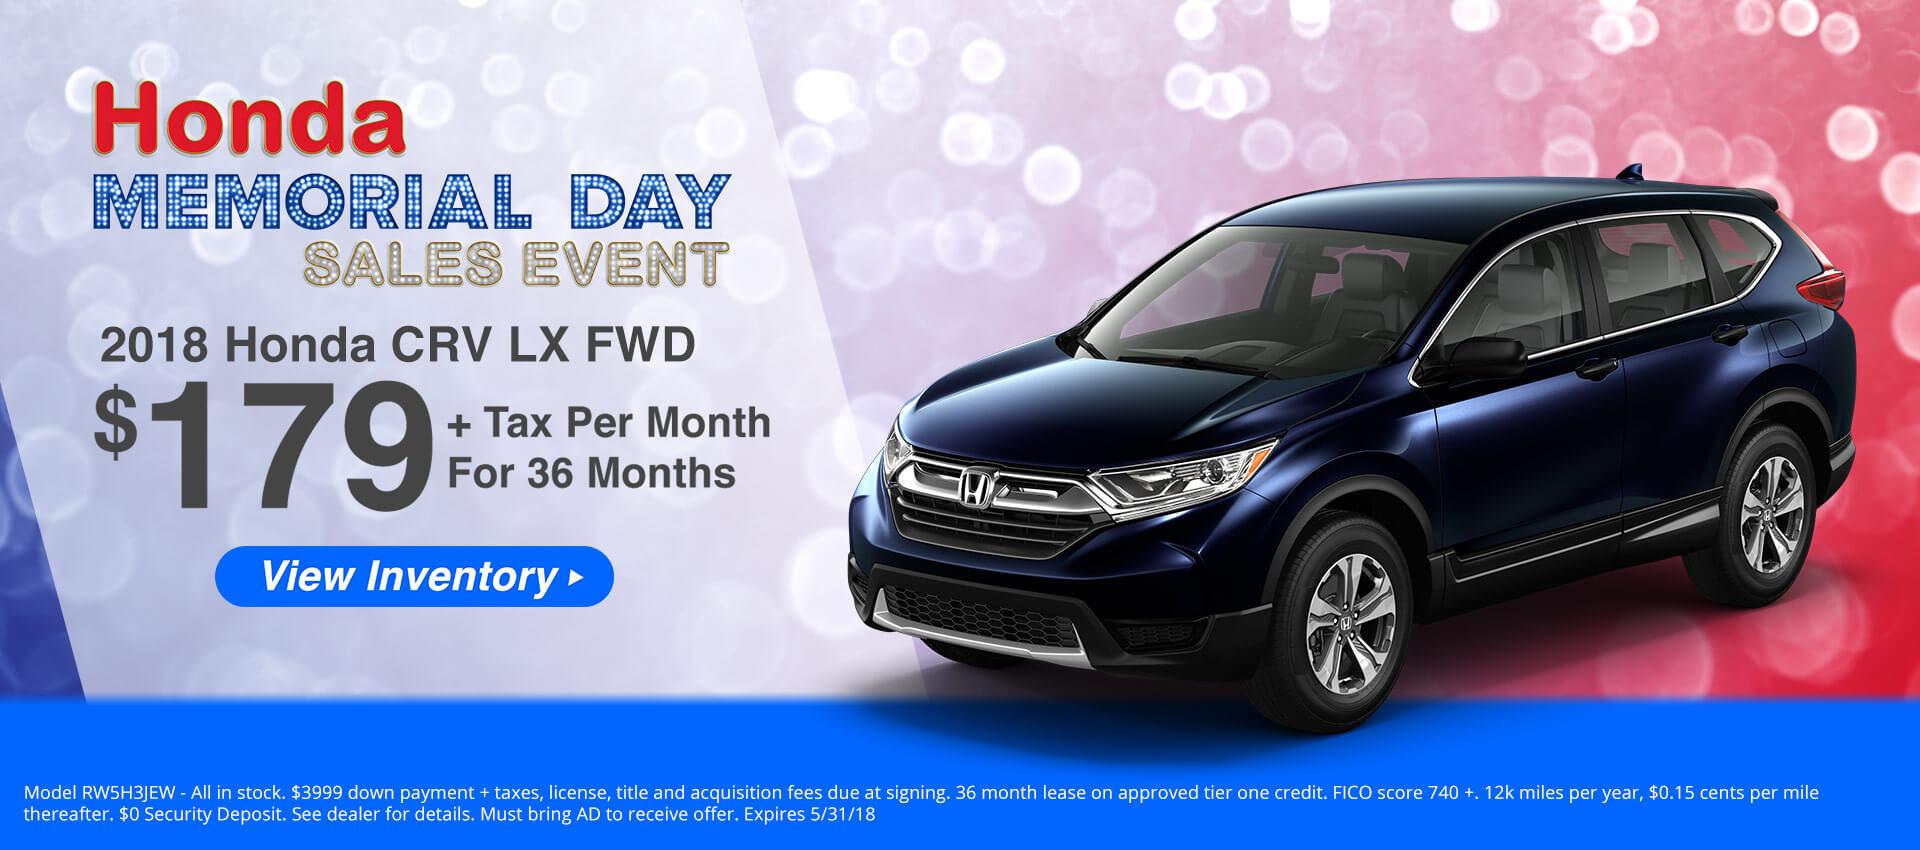 Honda CRV $179 Lease